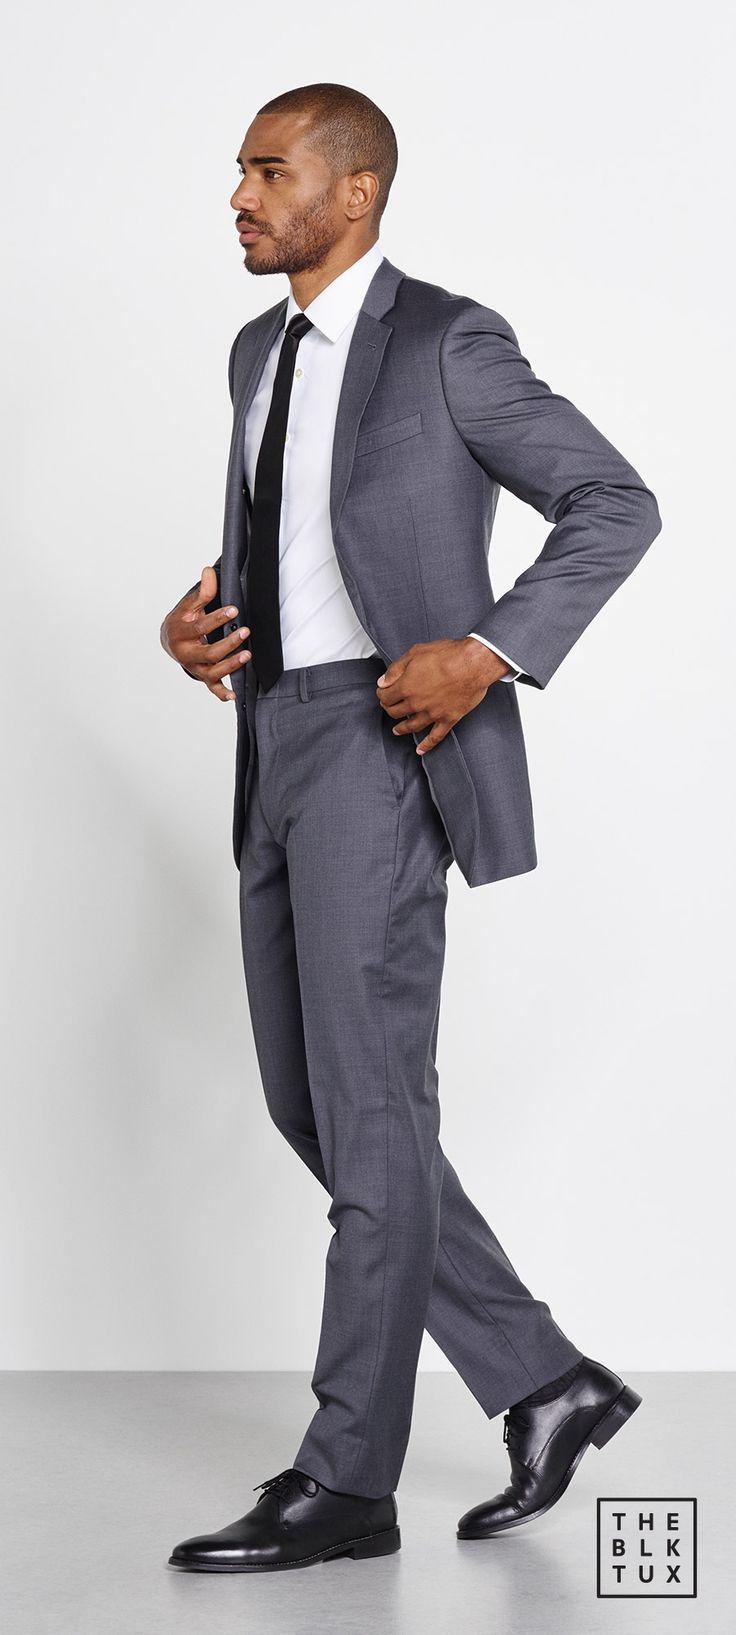 Suit Up in Style, The Black Tux Way 2017 online tuxedo rental service the grey suit groom groommen best man style -- #theblacktux #tuxedo #tuxedorental